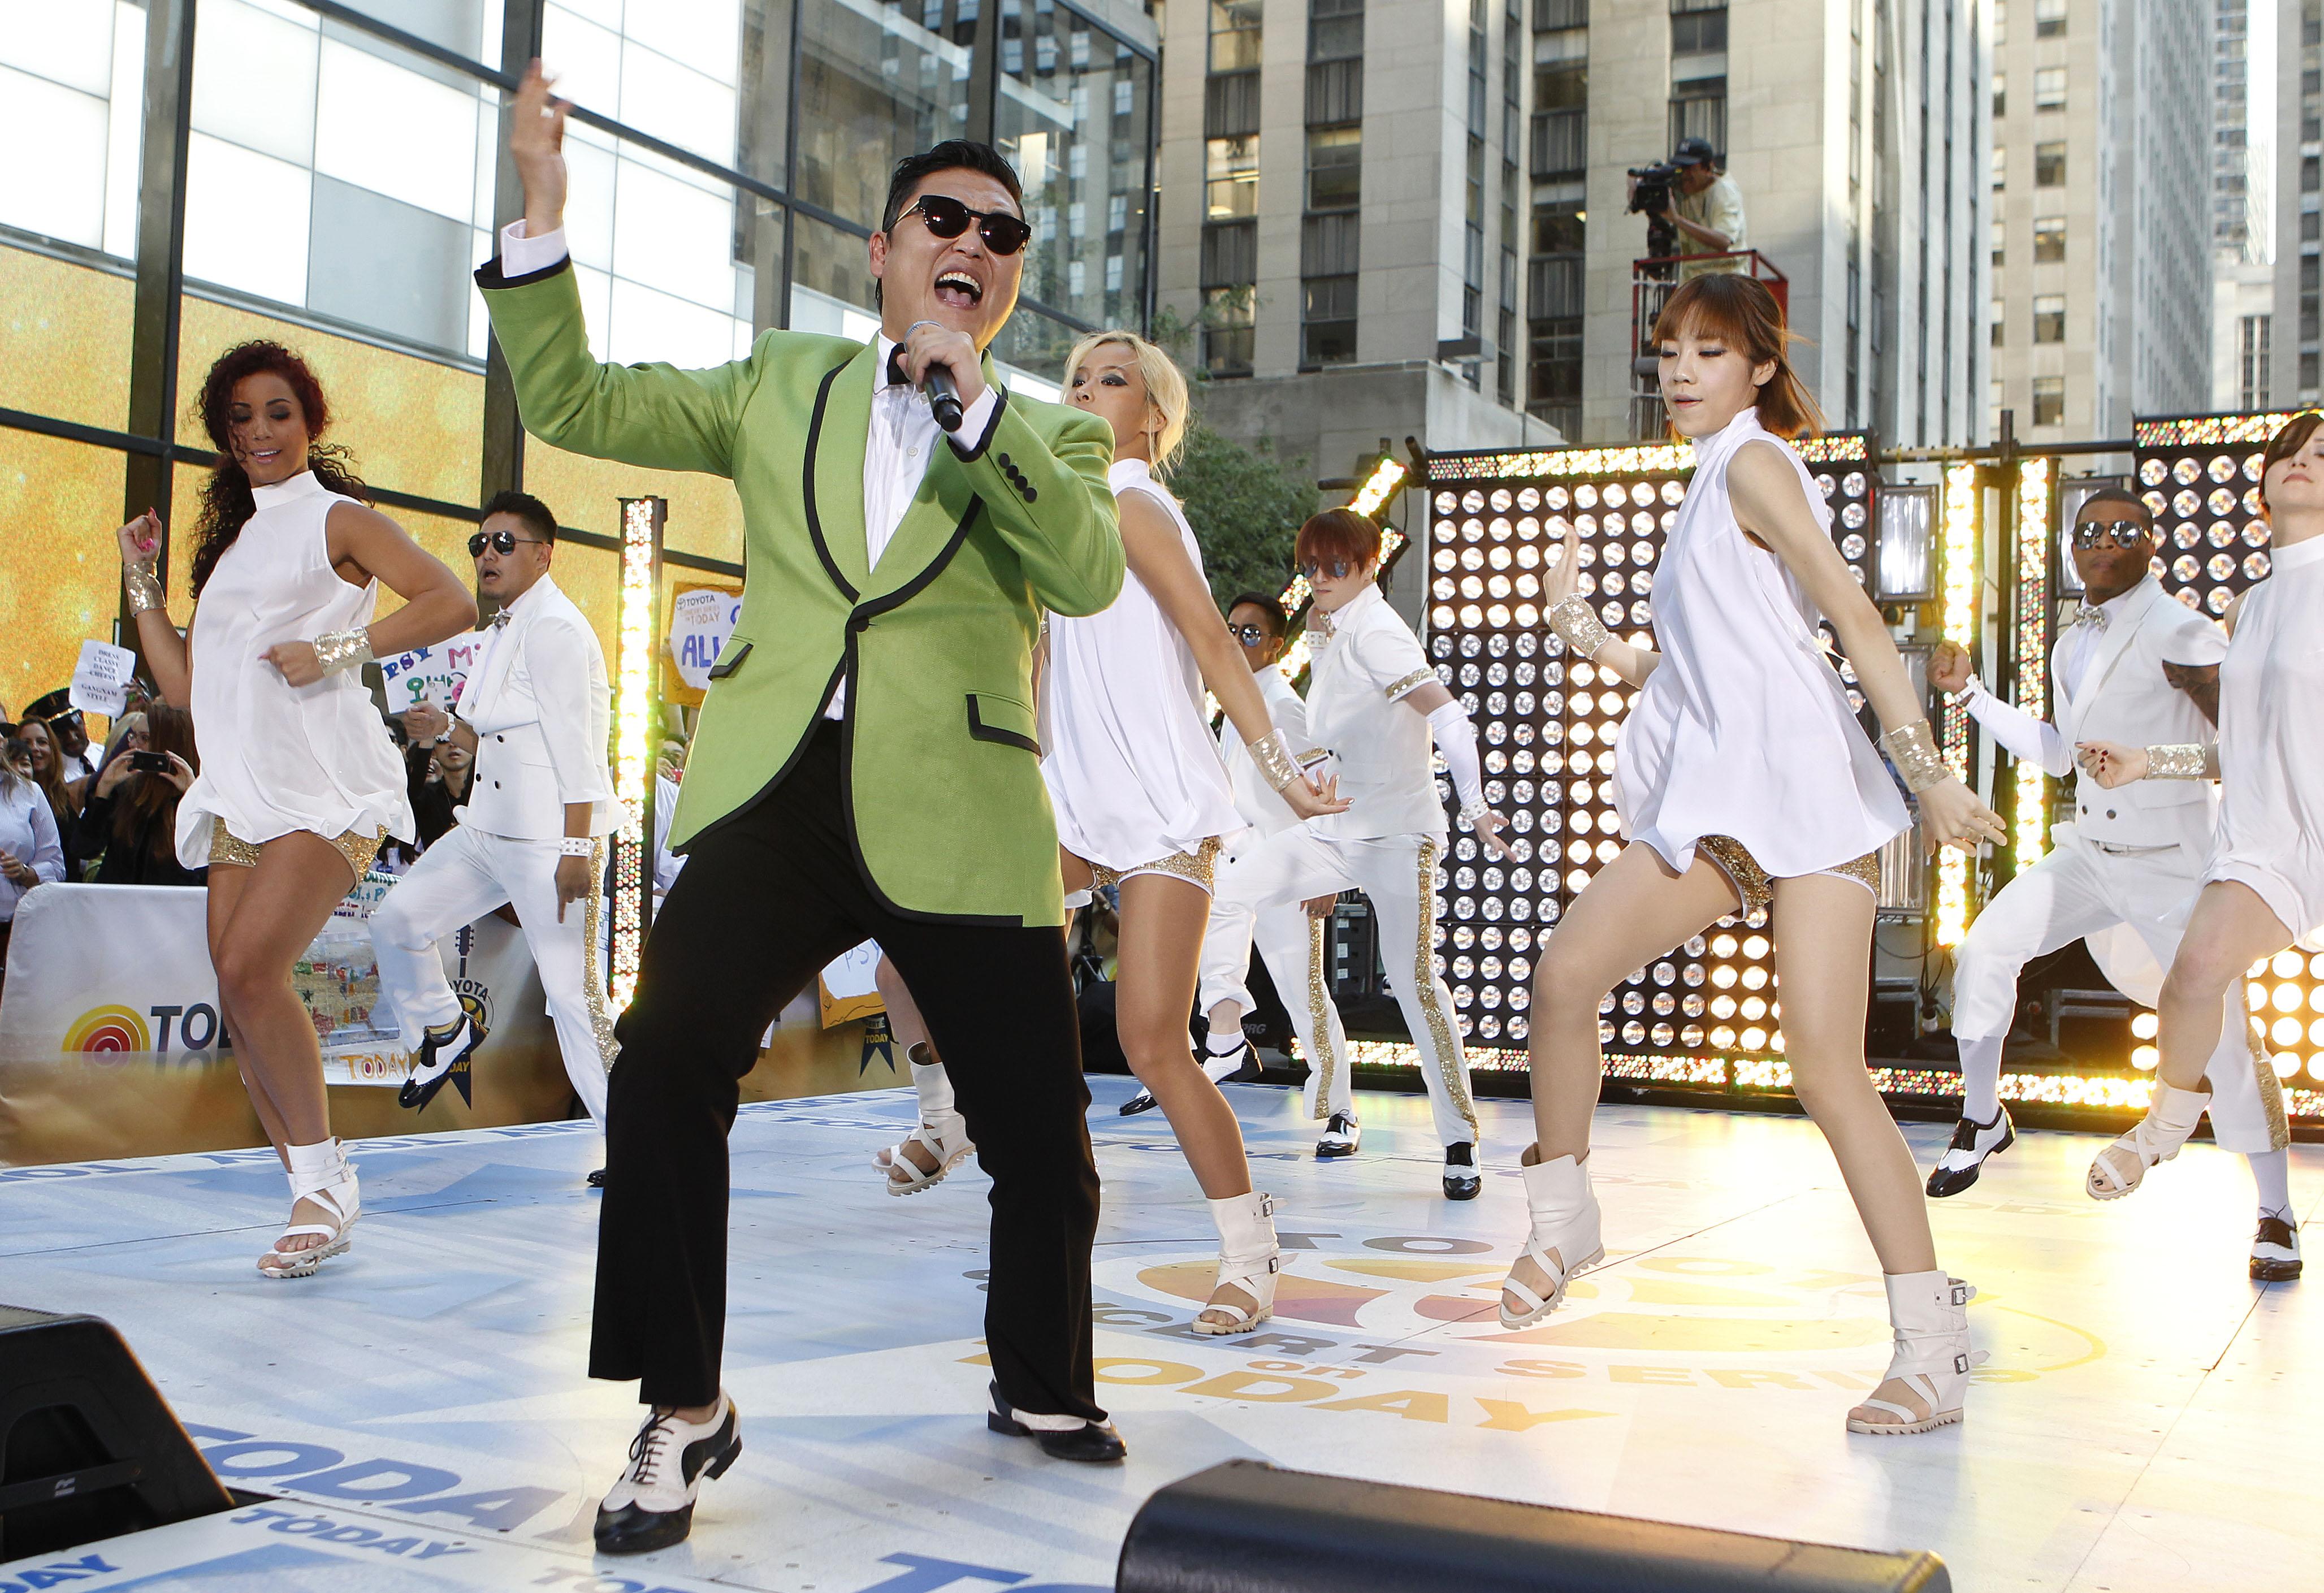 gangym style Hiru tv - on ataka nataka - 2013-08-04 - hora yaka හිරු ටීවී - ඕං ආටක නාටක - 2013-08-04 - හොර යකා.